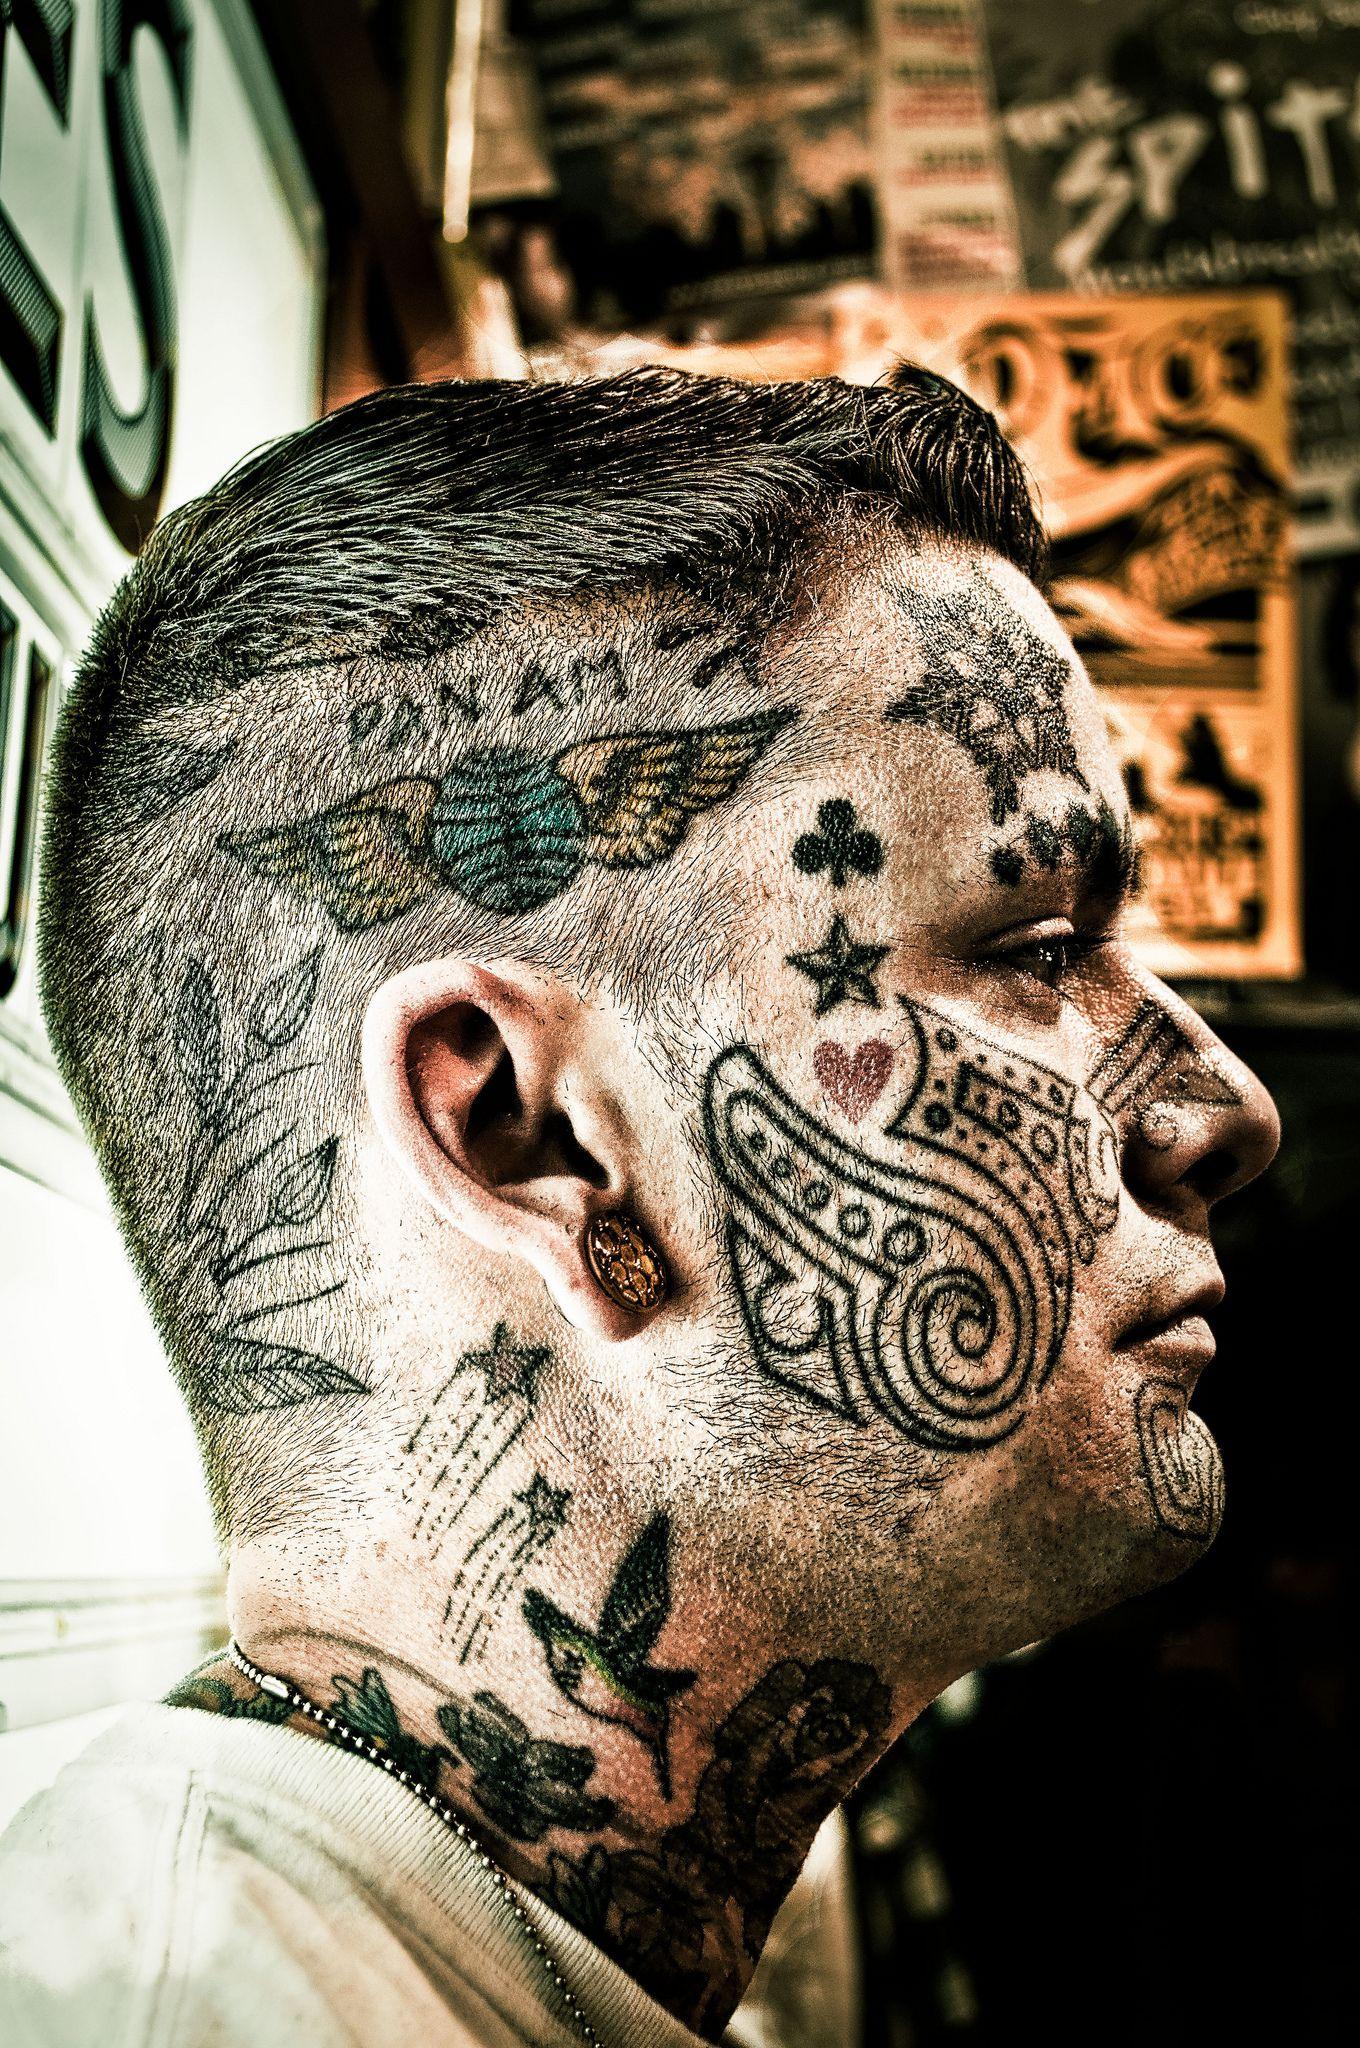 395d6e5ce 20 Awesome Face Tattoo Designs | Tattoo Inspiration | Tattoo designs ...